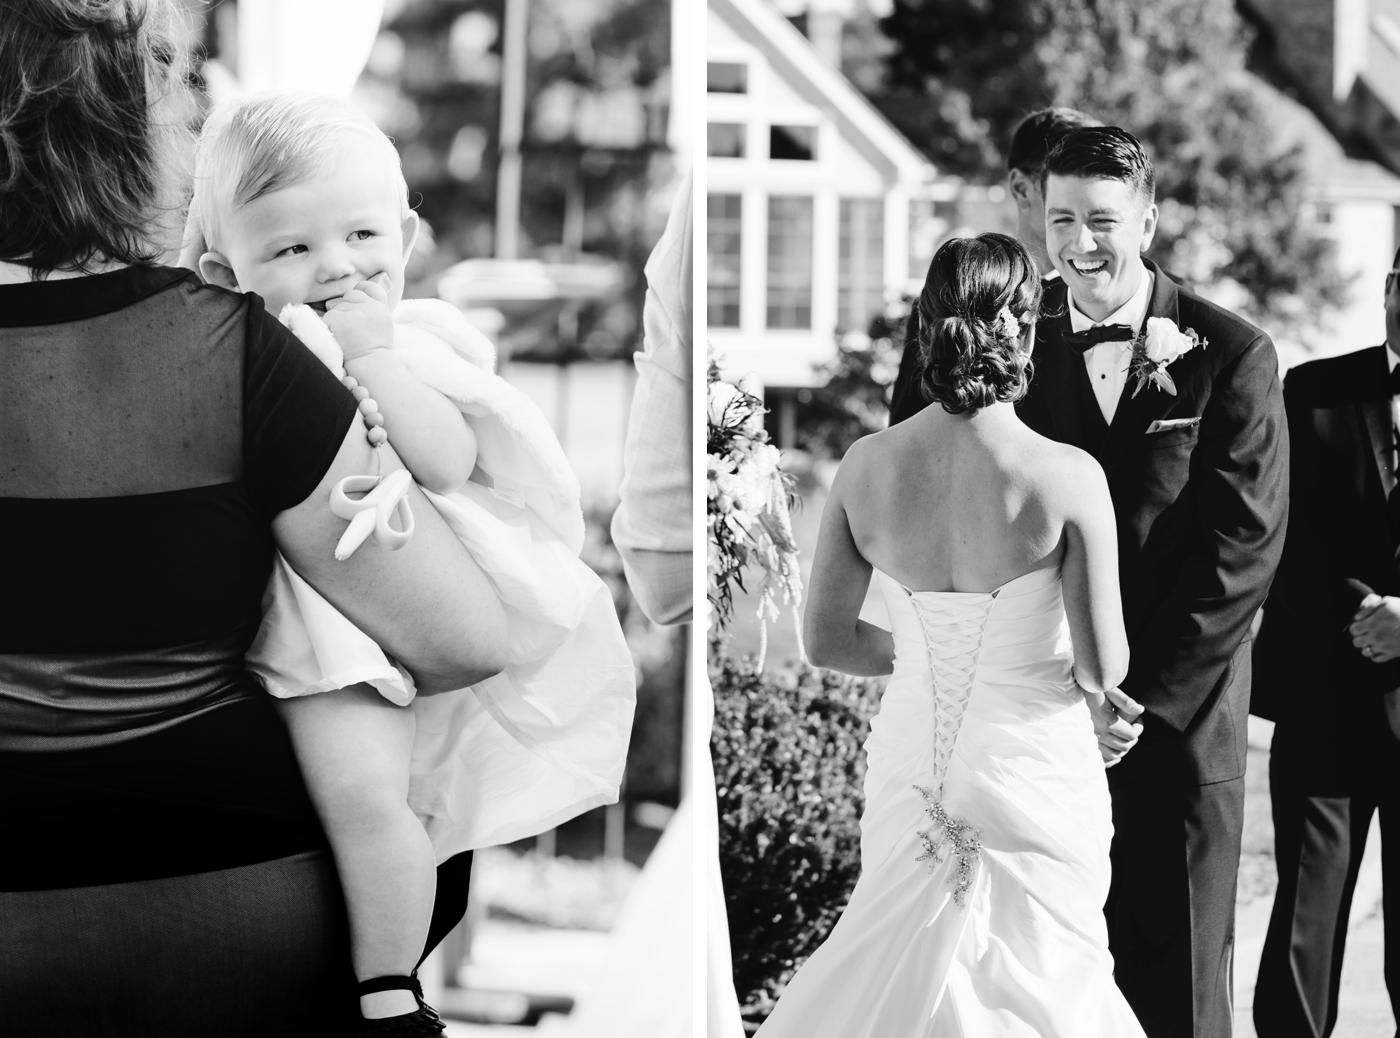 chicago-fine-art-wedding-photography-friel18